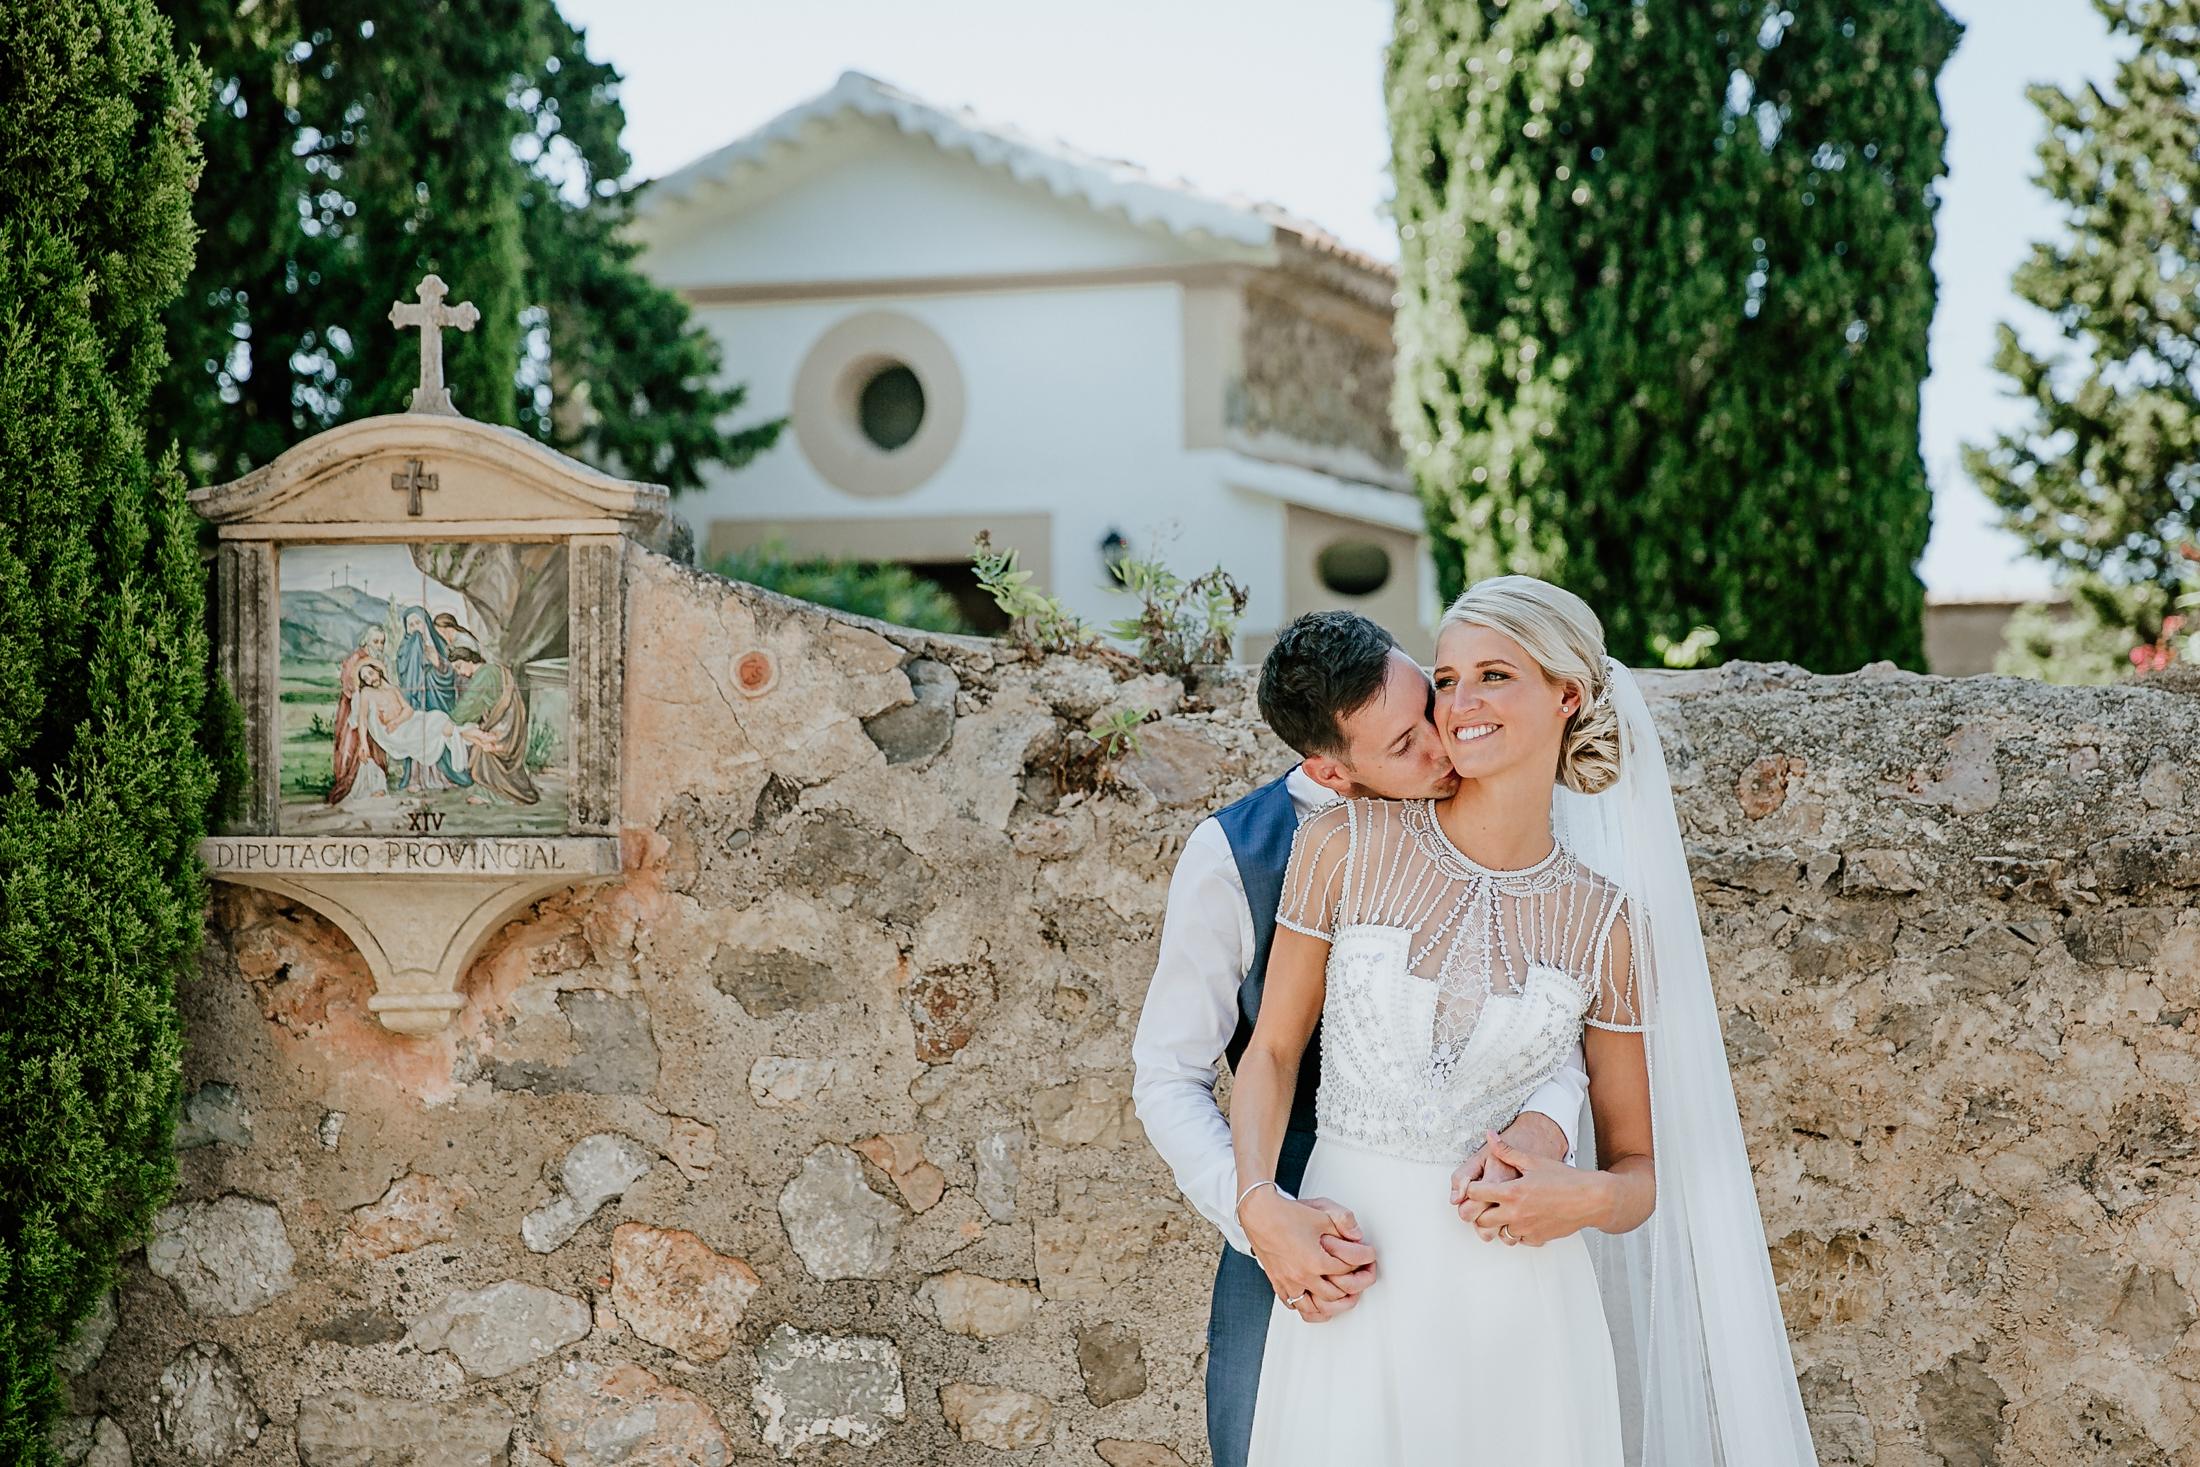 Weddings at La Residencia